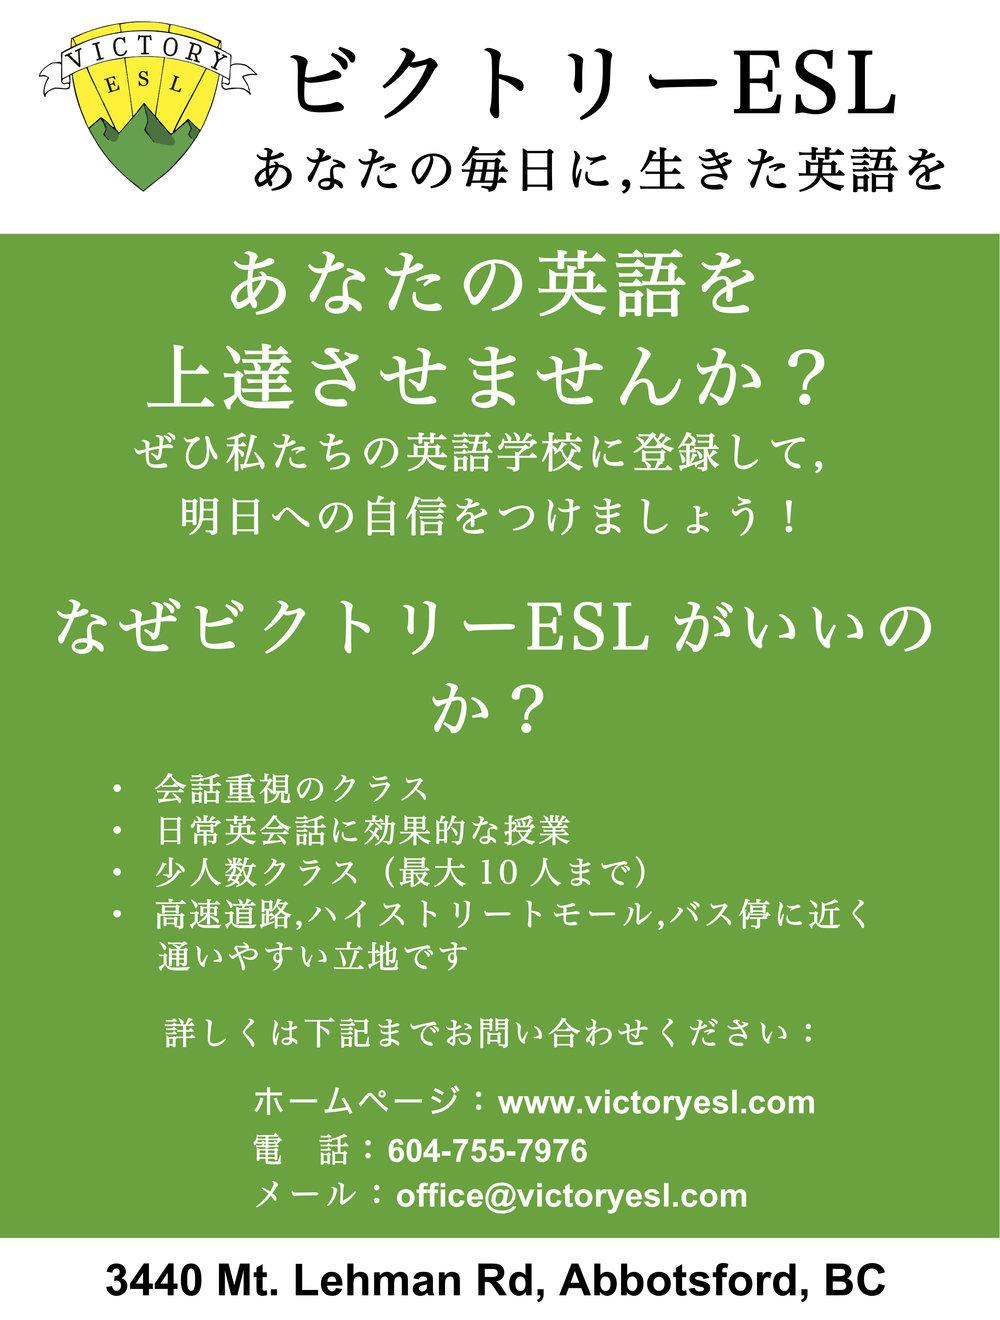 Victory ESL - Japanese